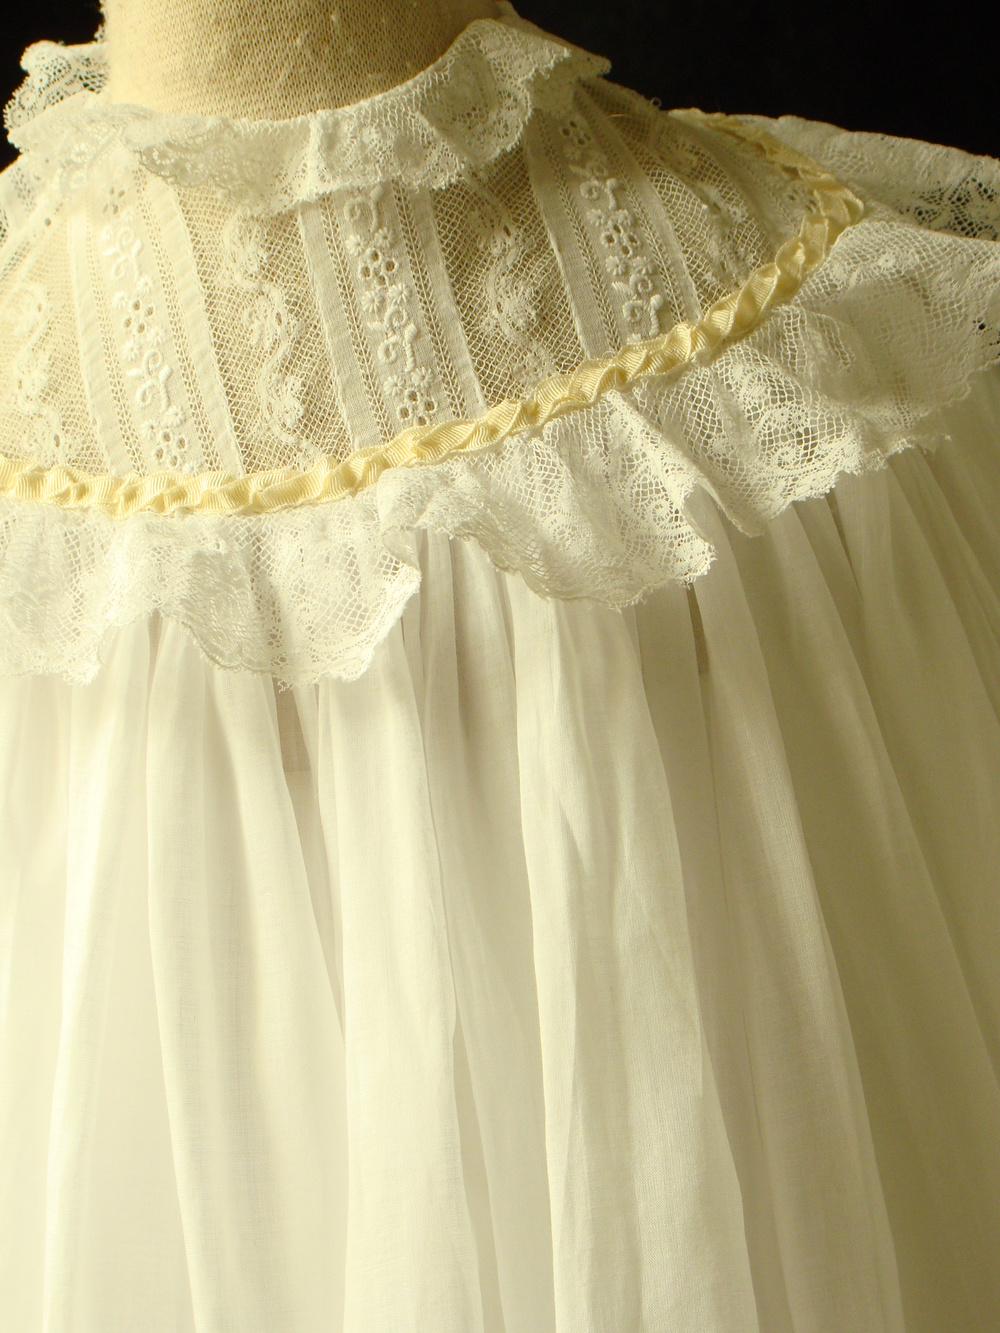 gowns3 033.JPG